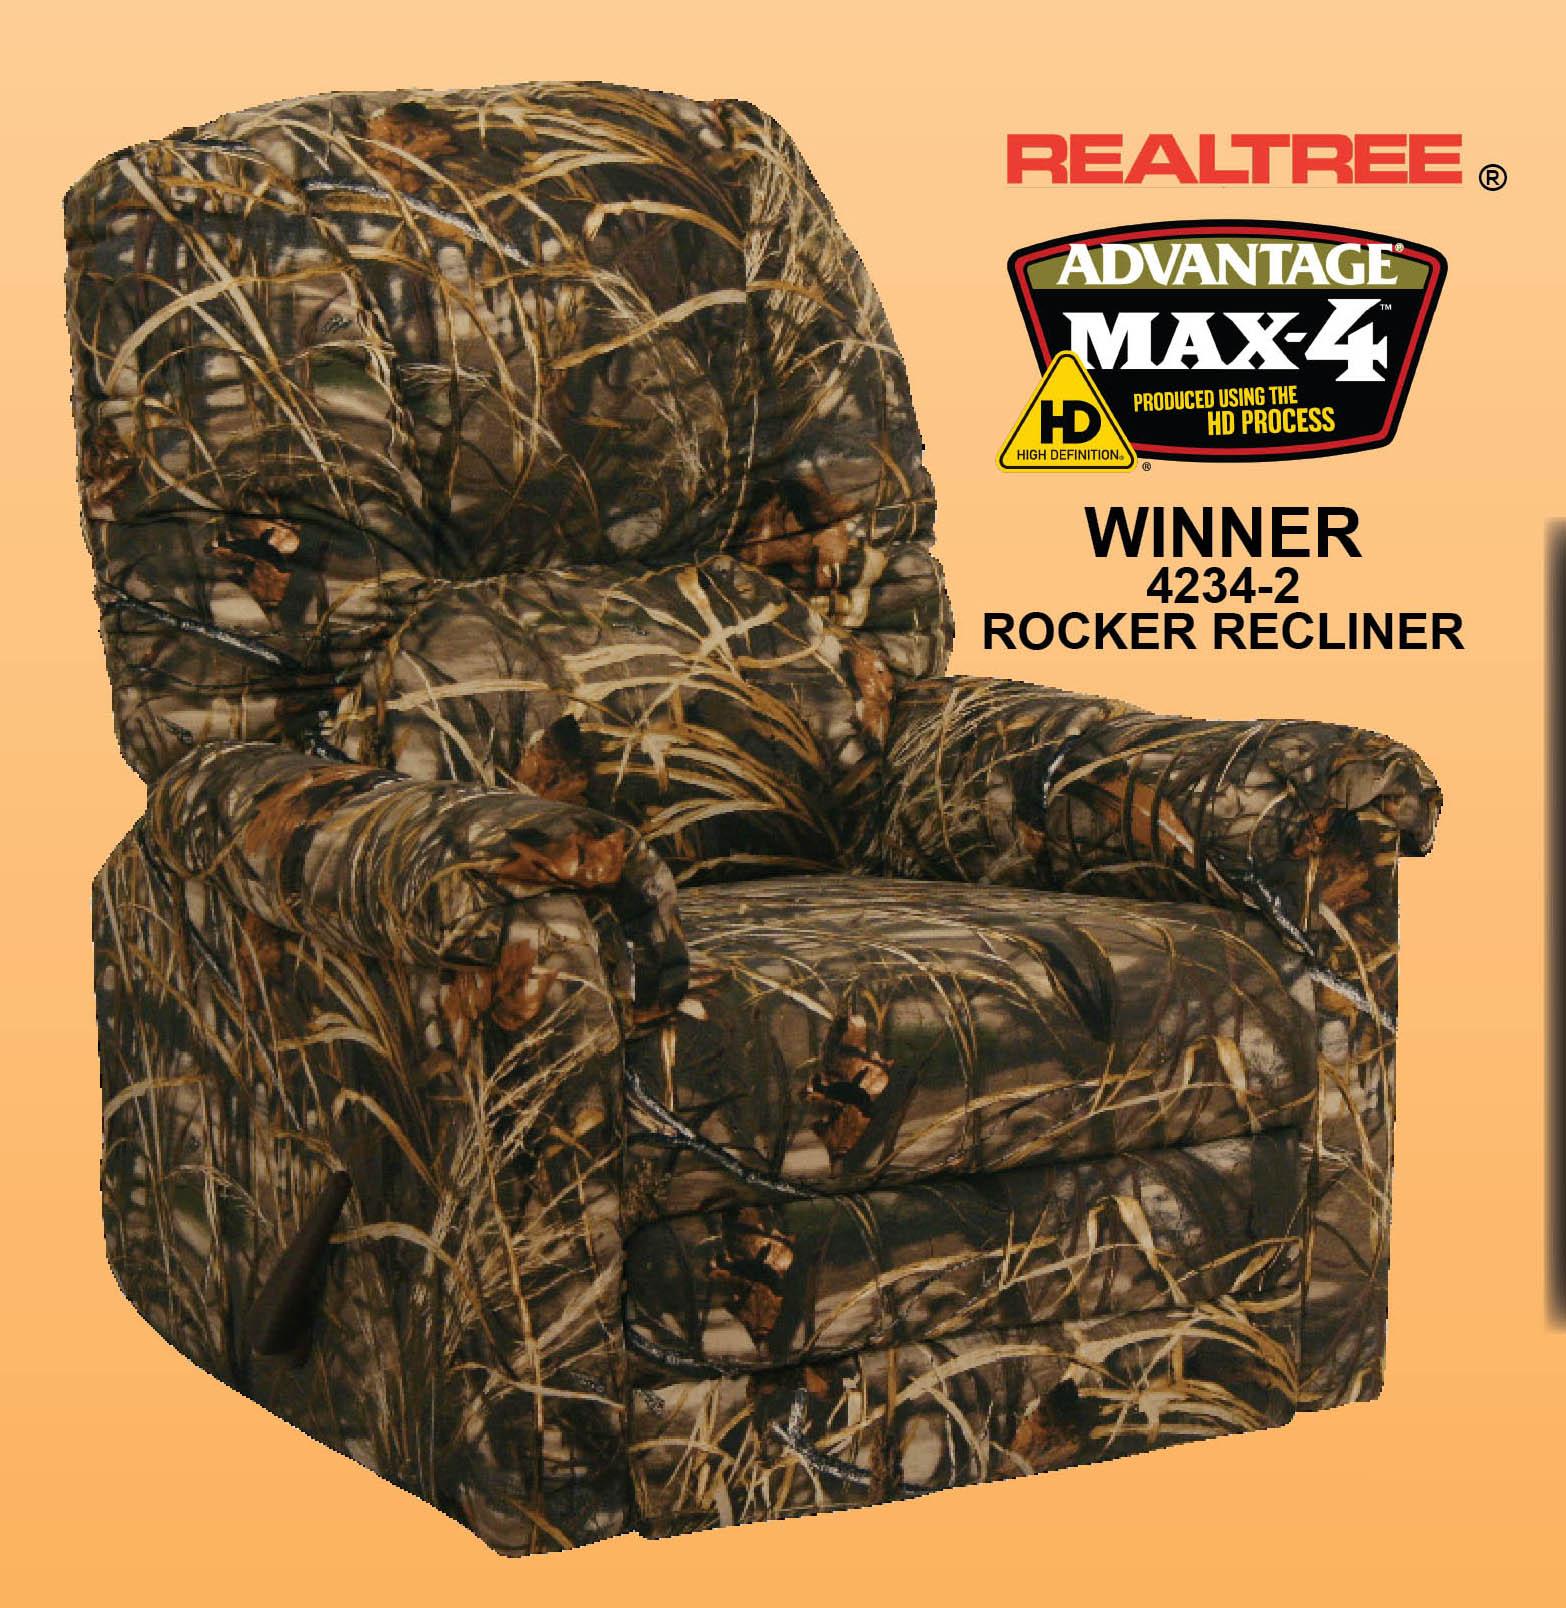 Winner MAX 4  Realtree Camouflage Rocker Recliner by